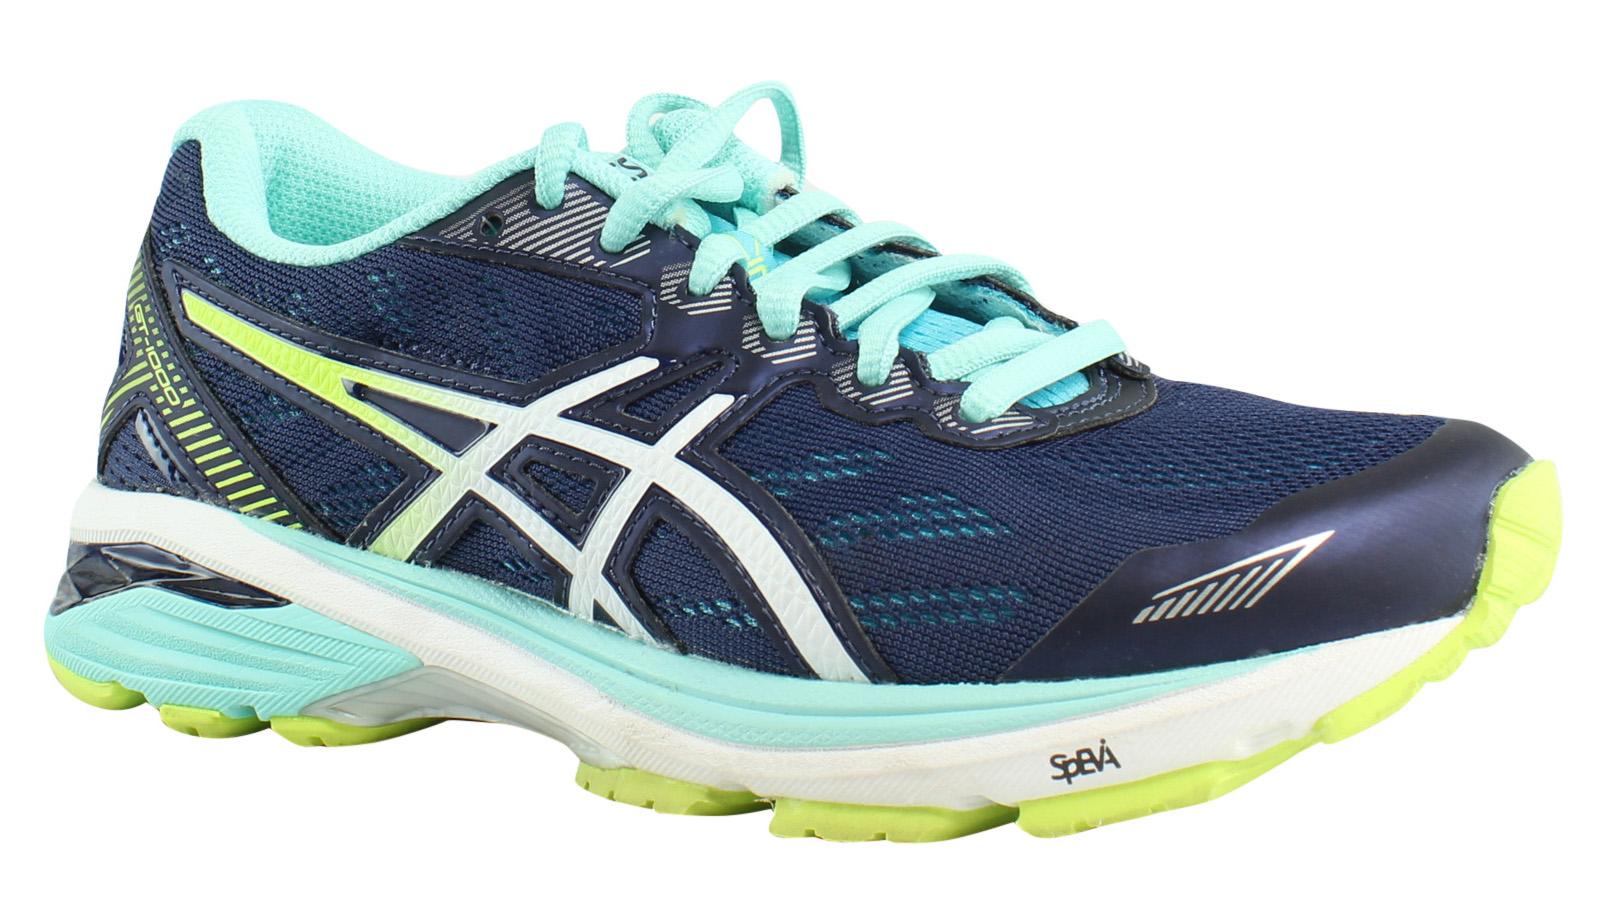 ASICS Damenschuhe - Blau Running Schuhes Größe 5 (347124)